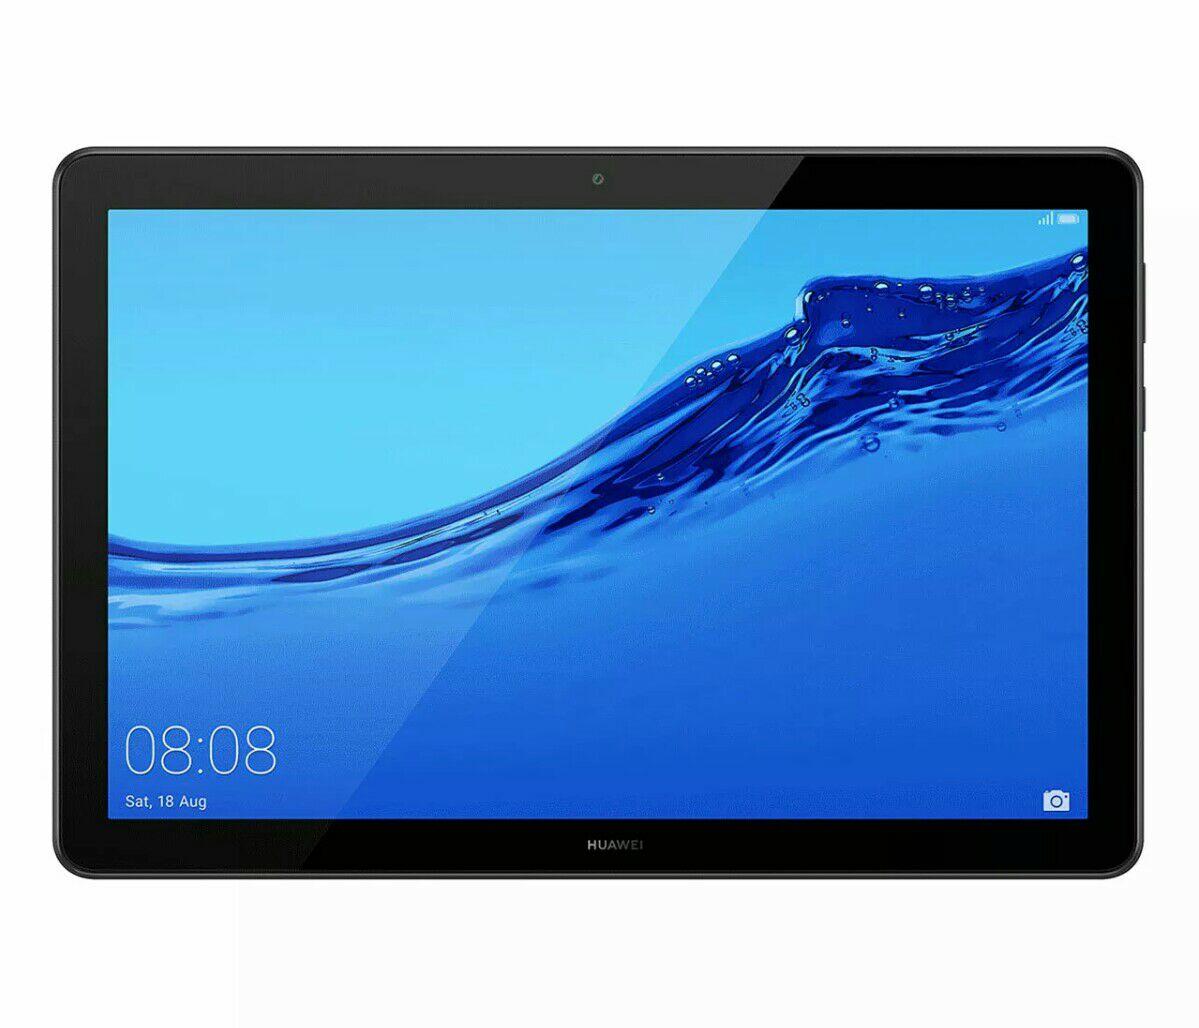 "New Huawei MediaPad T5 10.1"" Wifi Tablet, 3GB RAM, 32GB Storage - Black £119.99 @ ebay / laptopoutletdirect"